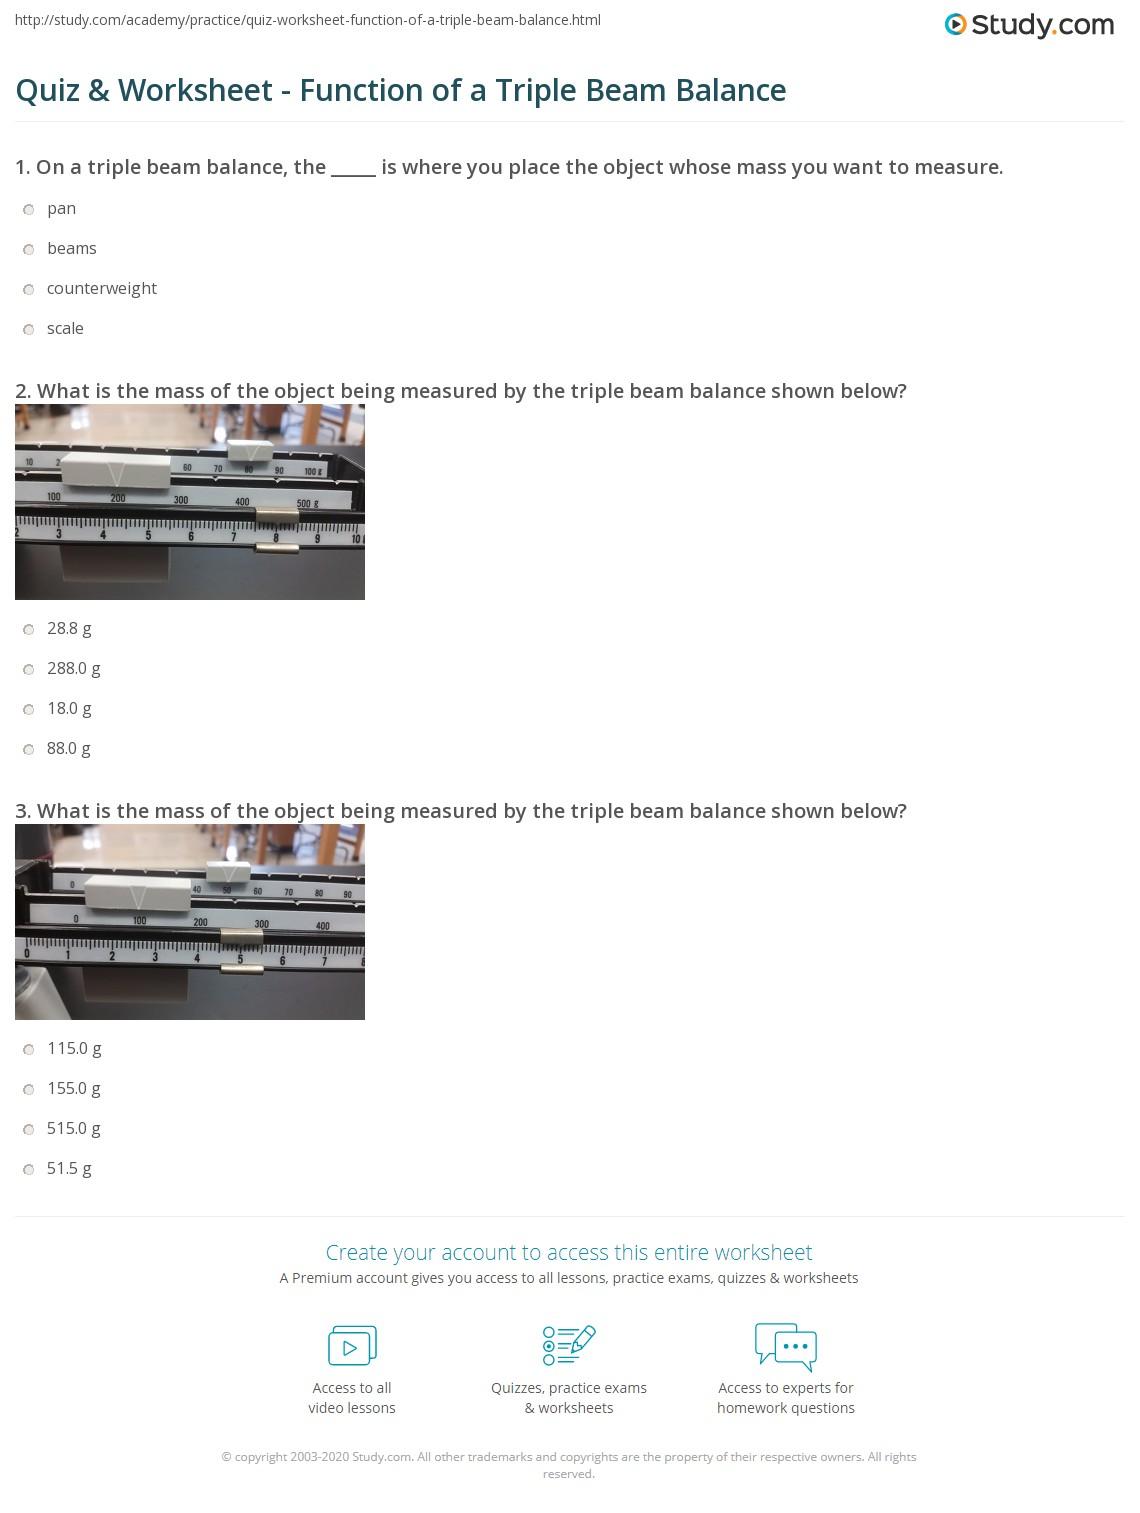 Quiz W Ksheet Functi Of Triple Be M B L Nce Study